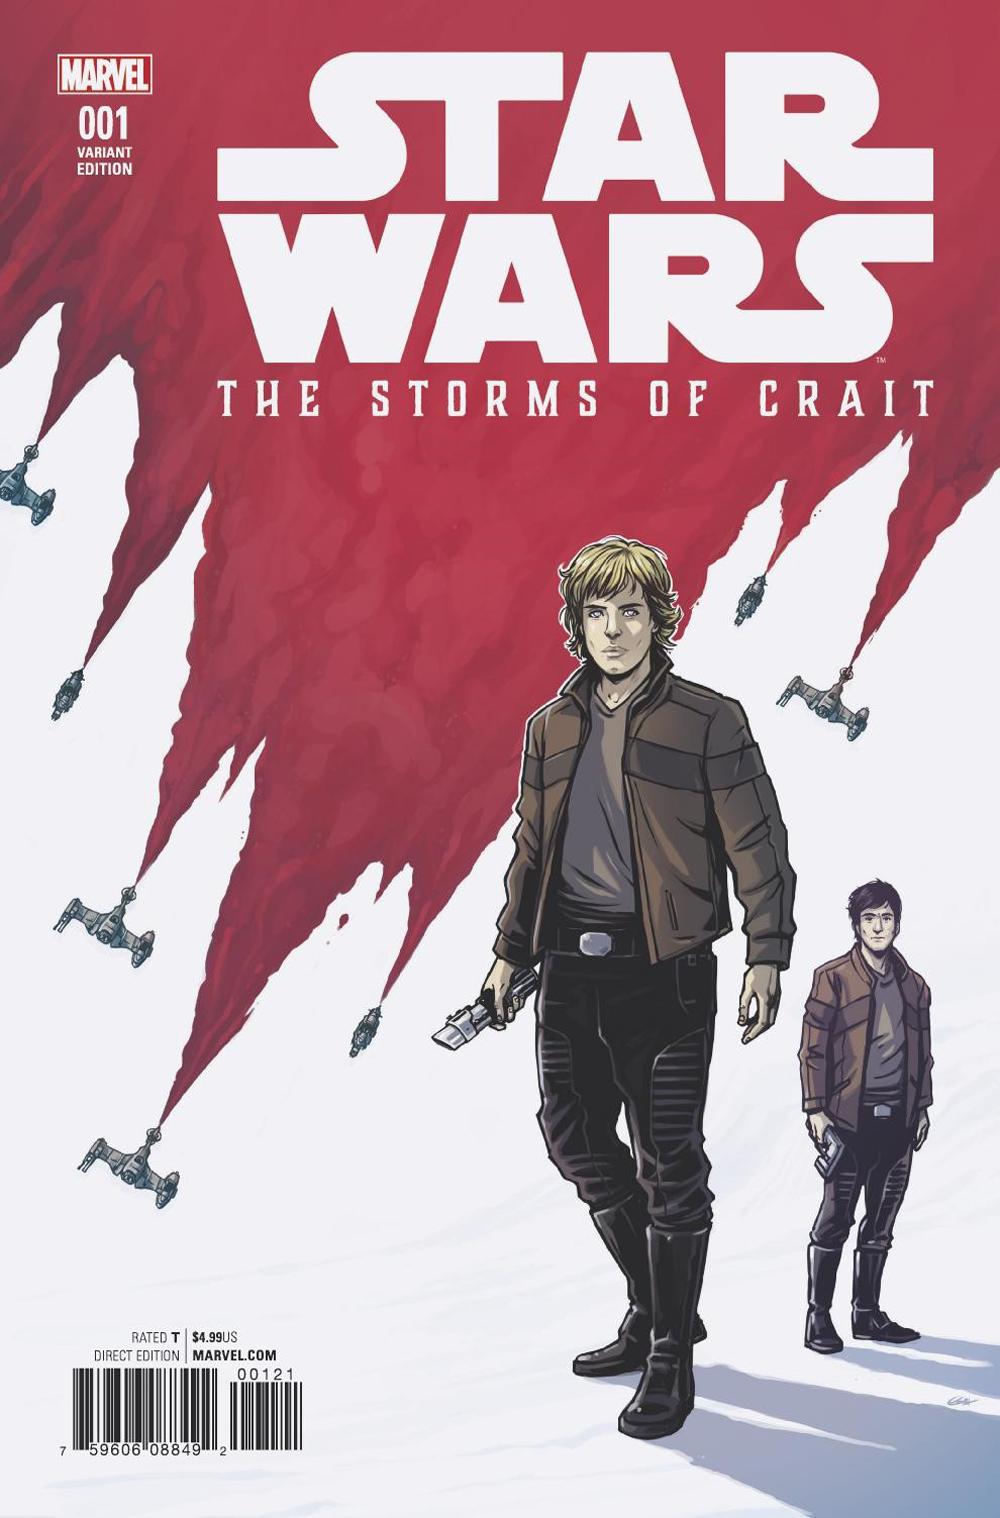 Star Wars: The Last Jedi: Storms of Crait #1 (Caspar Wijngaard Variant Cover) (27.12.2017)